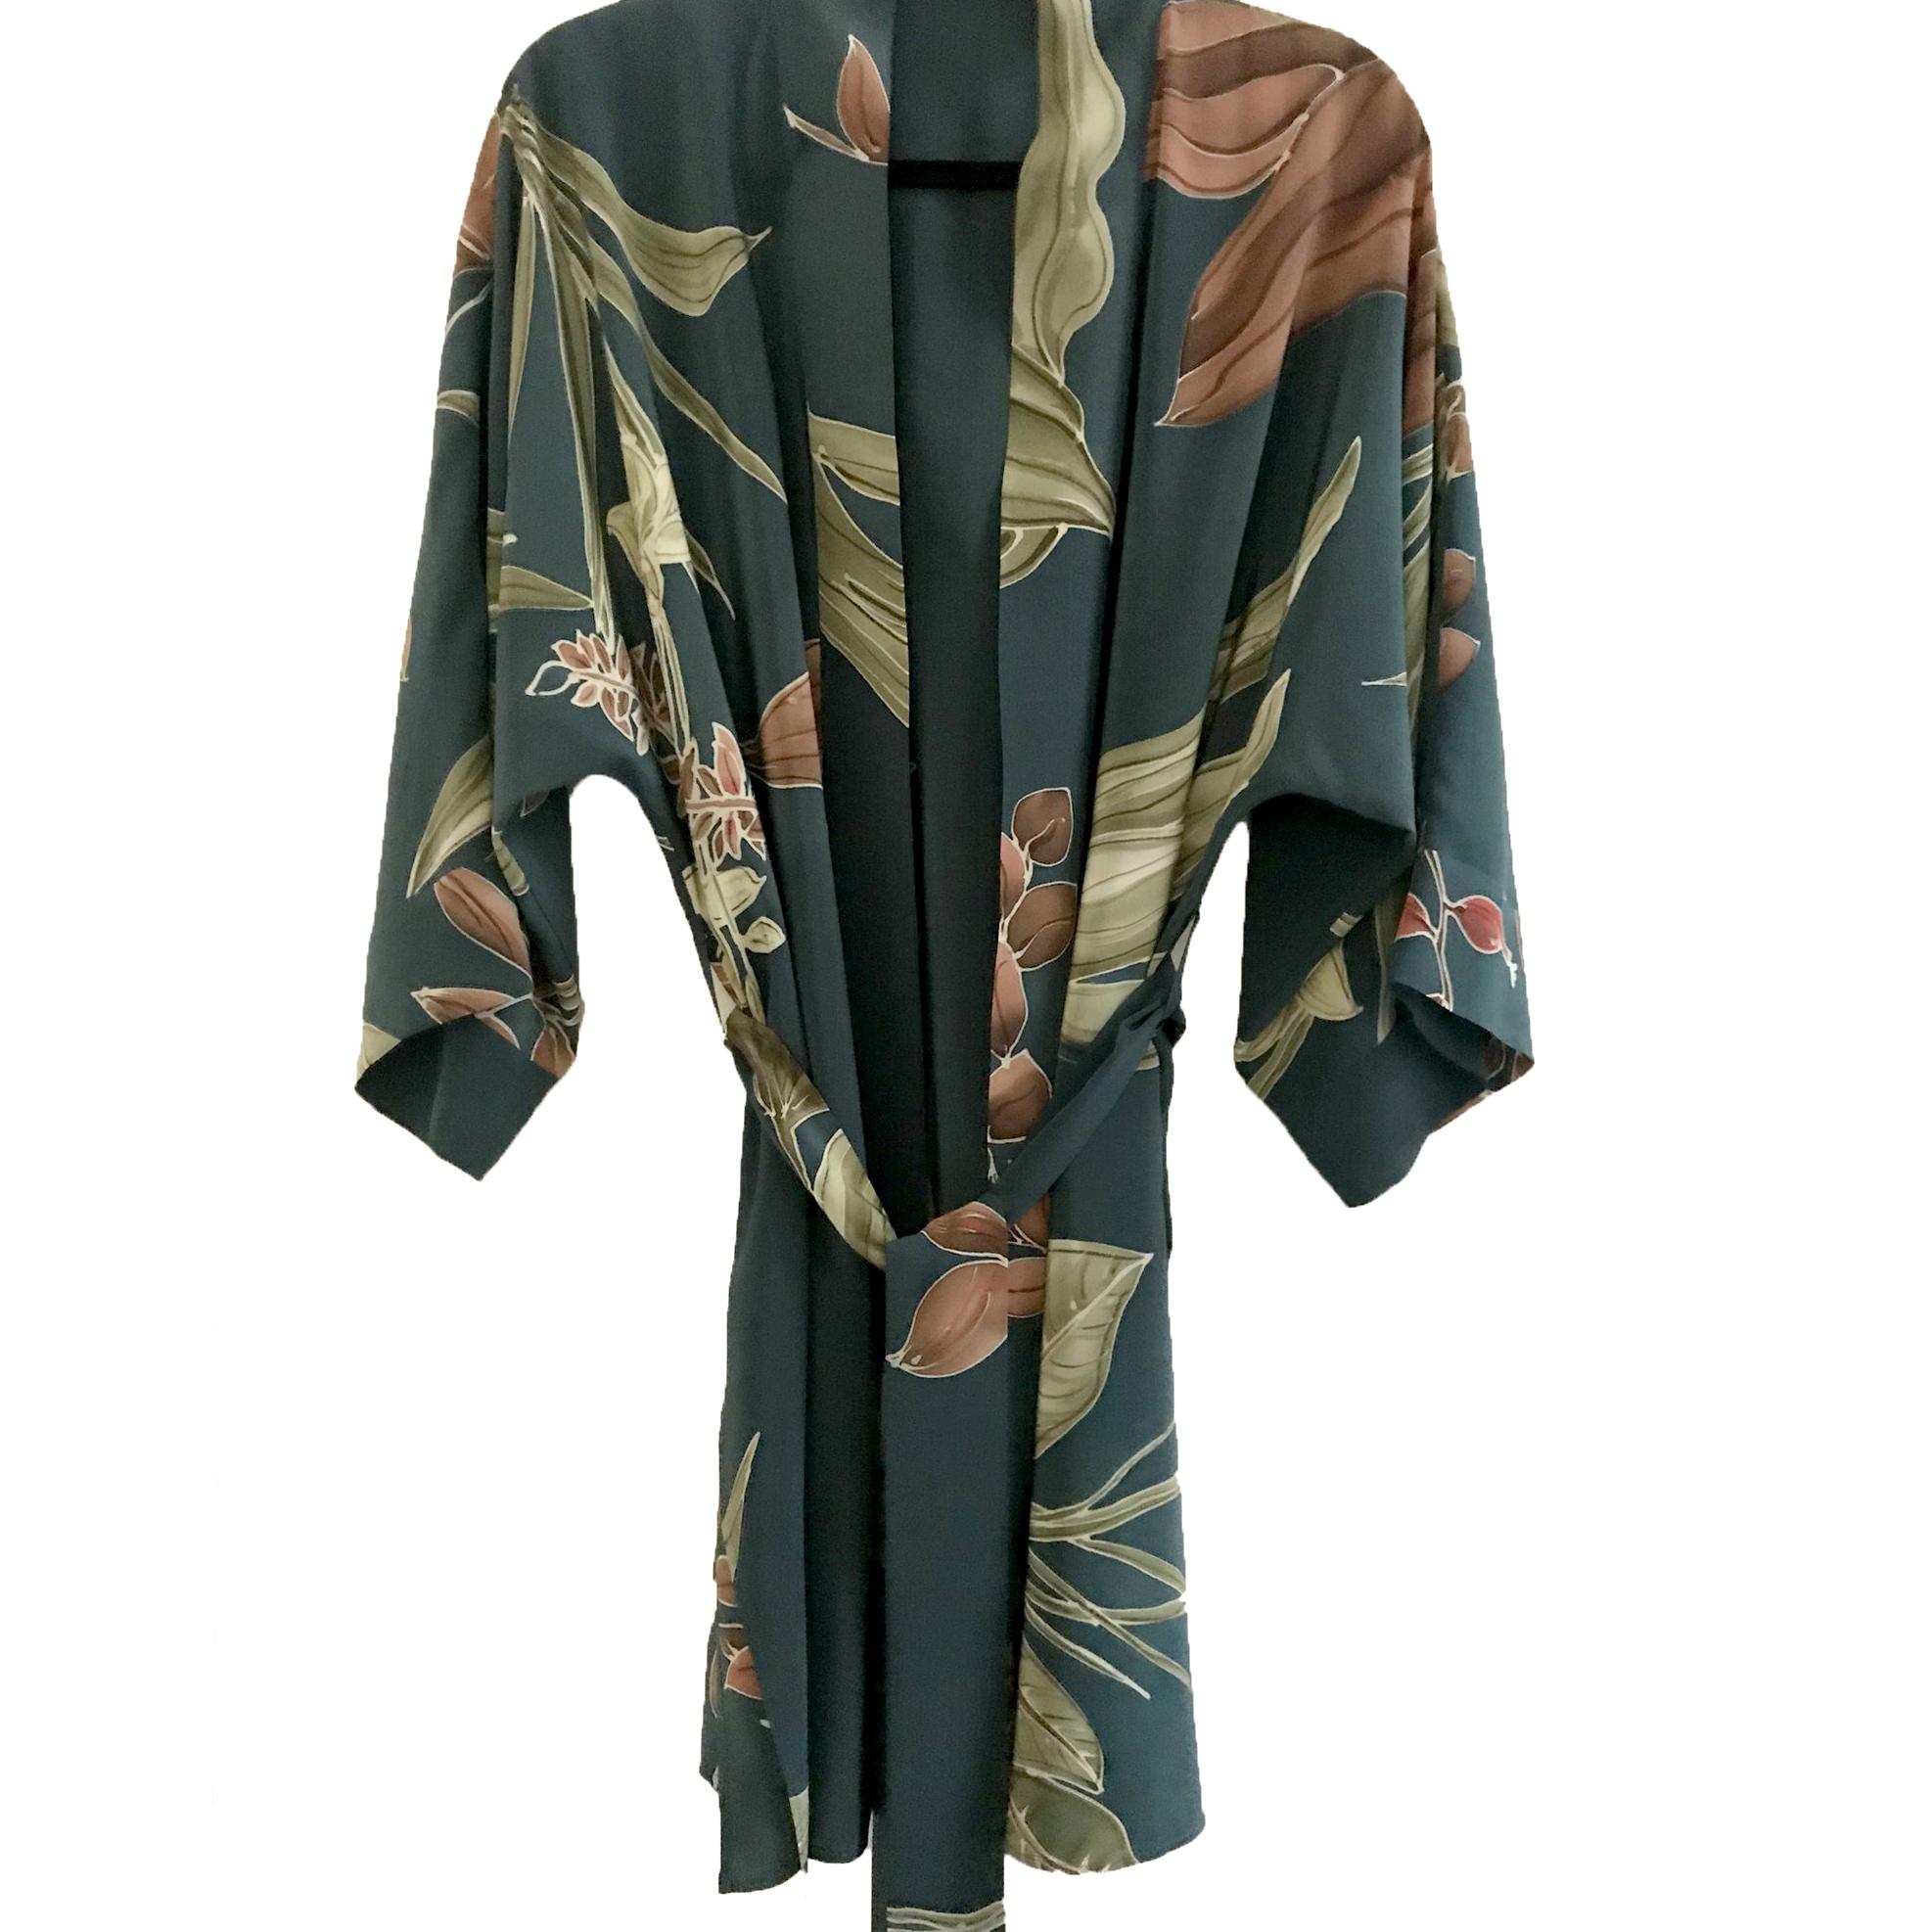 rory worby fall leaves kimono